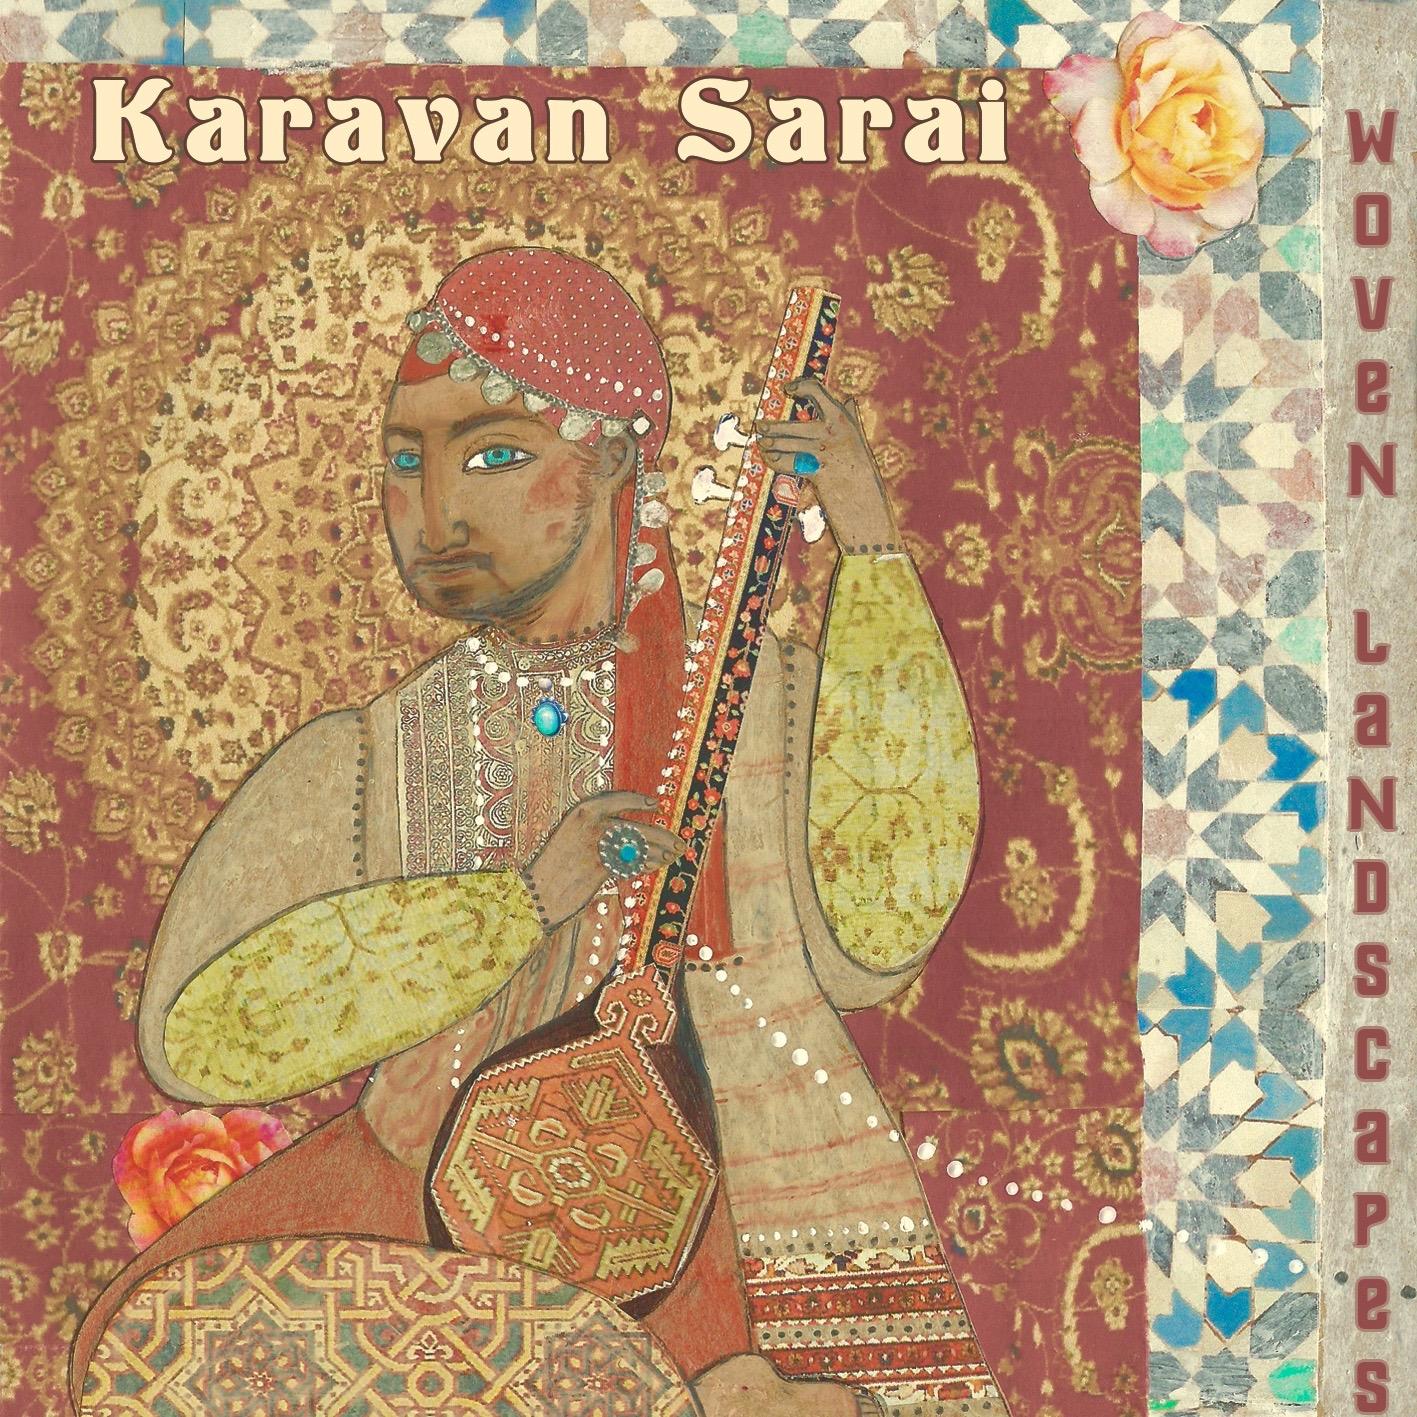 karavan-sarai-world-muisc-sufi